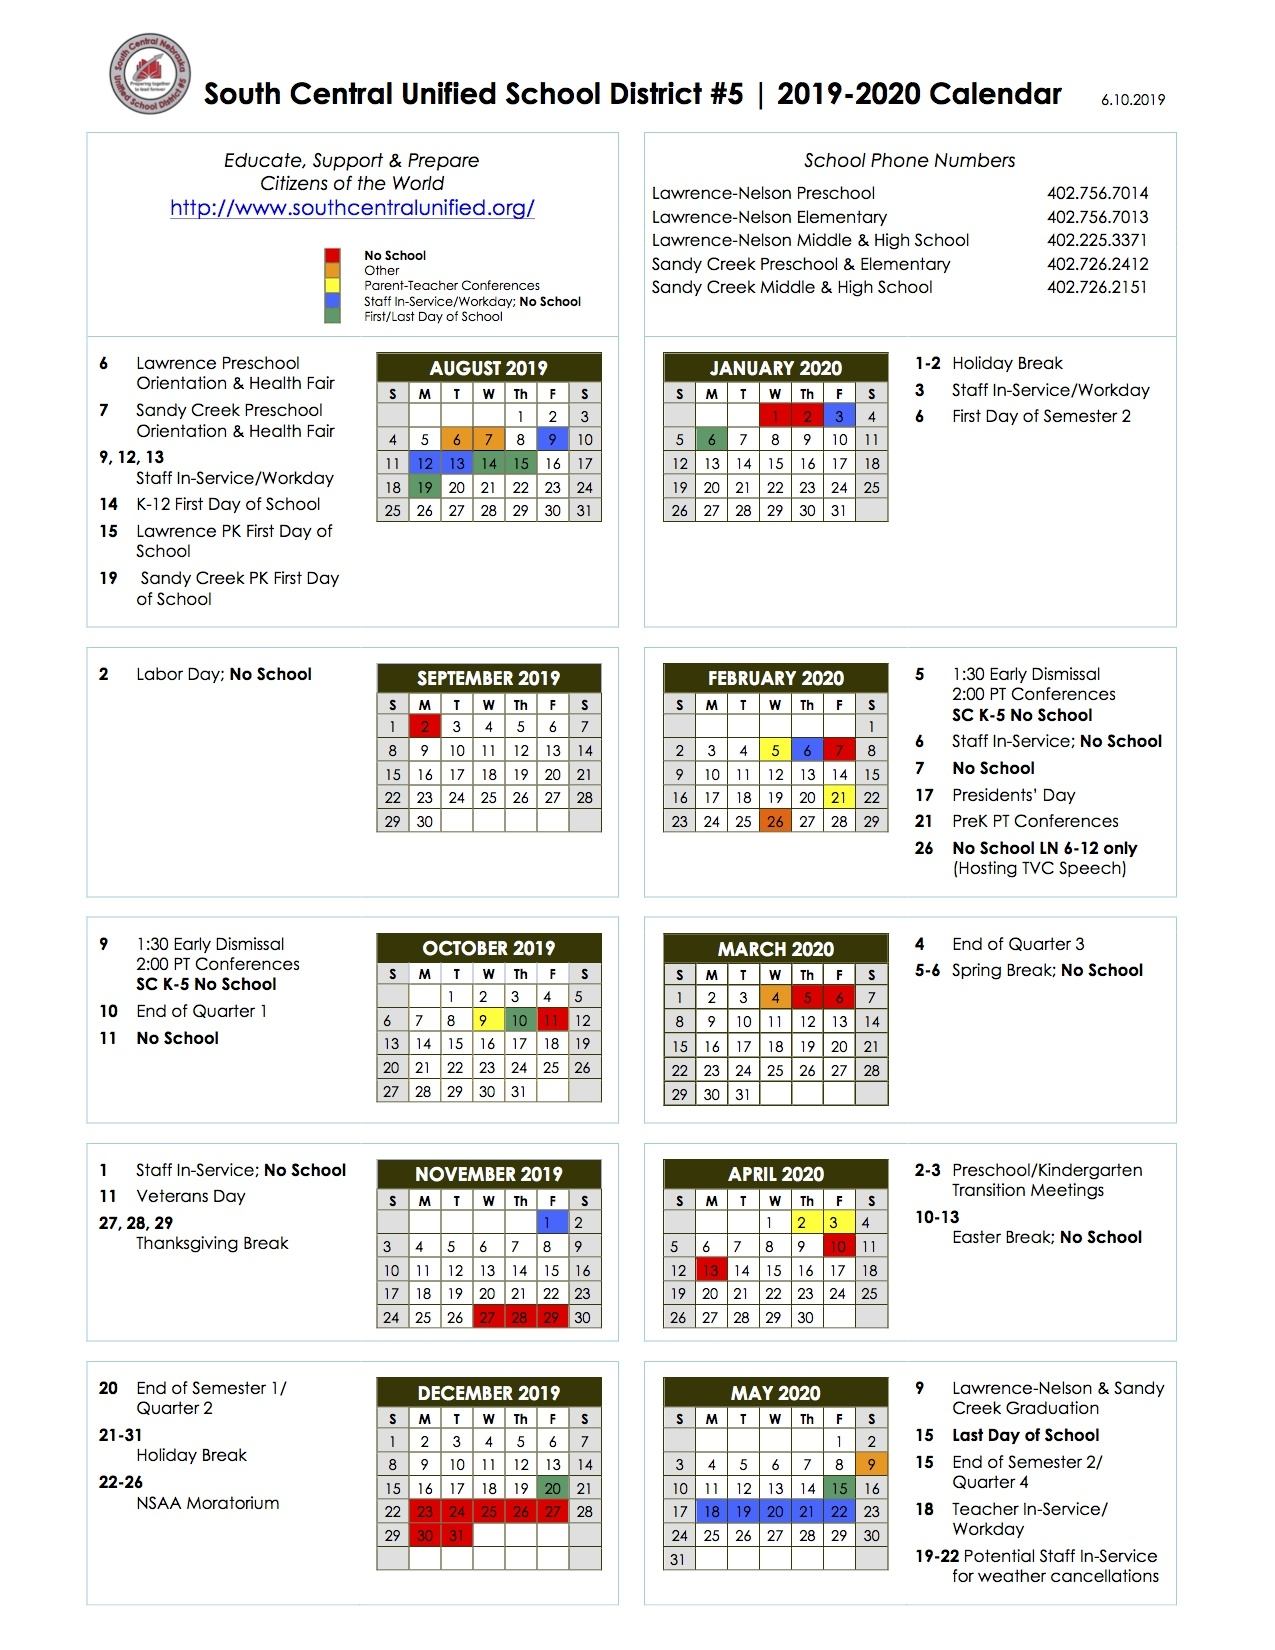 South Central Usd 5_School Calendar Clay County